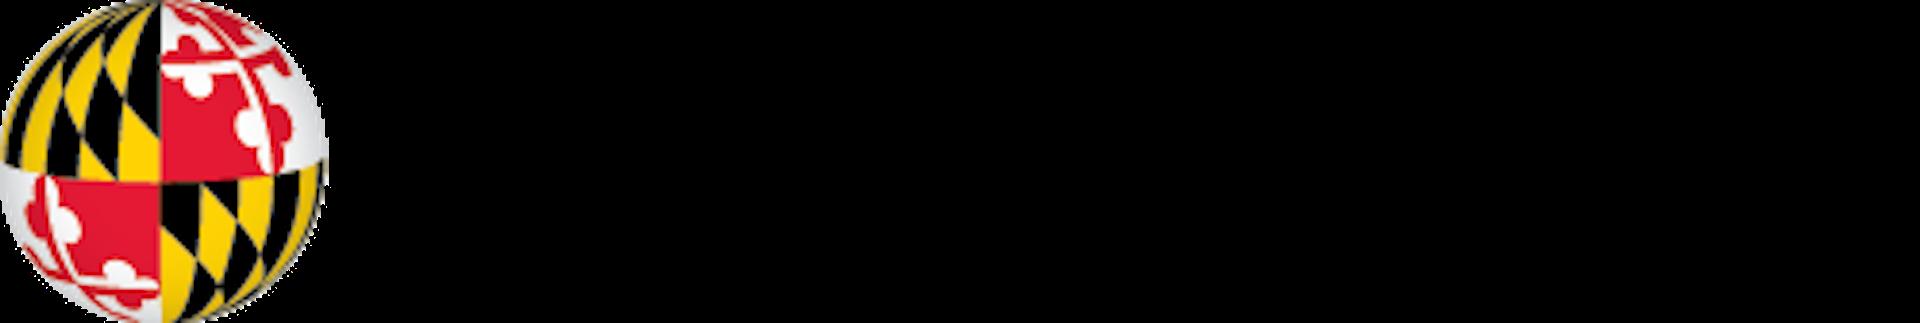 Logo 1477337626.png?ixlib=rb 1.1